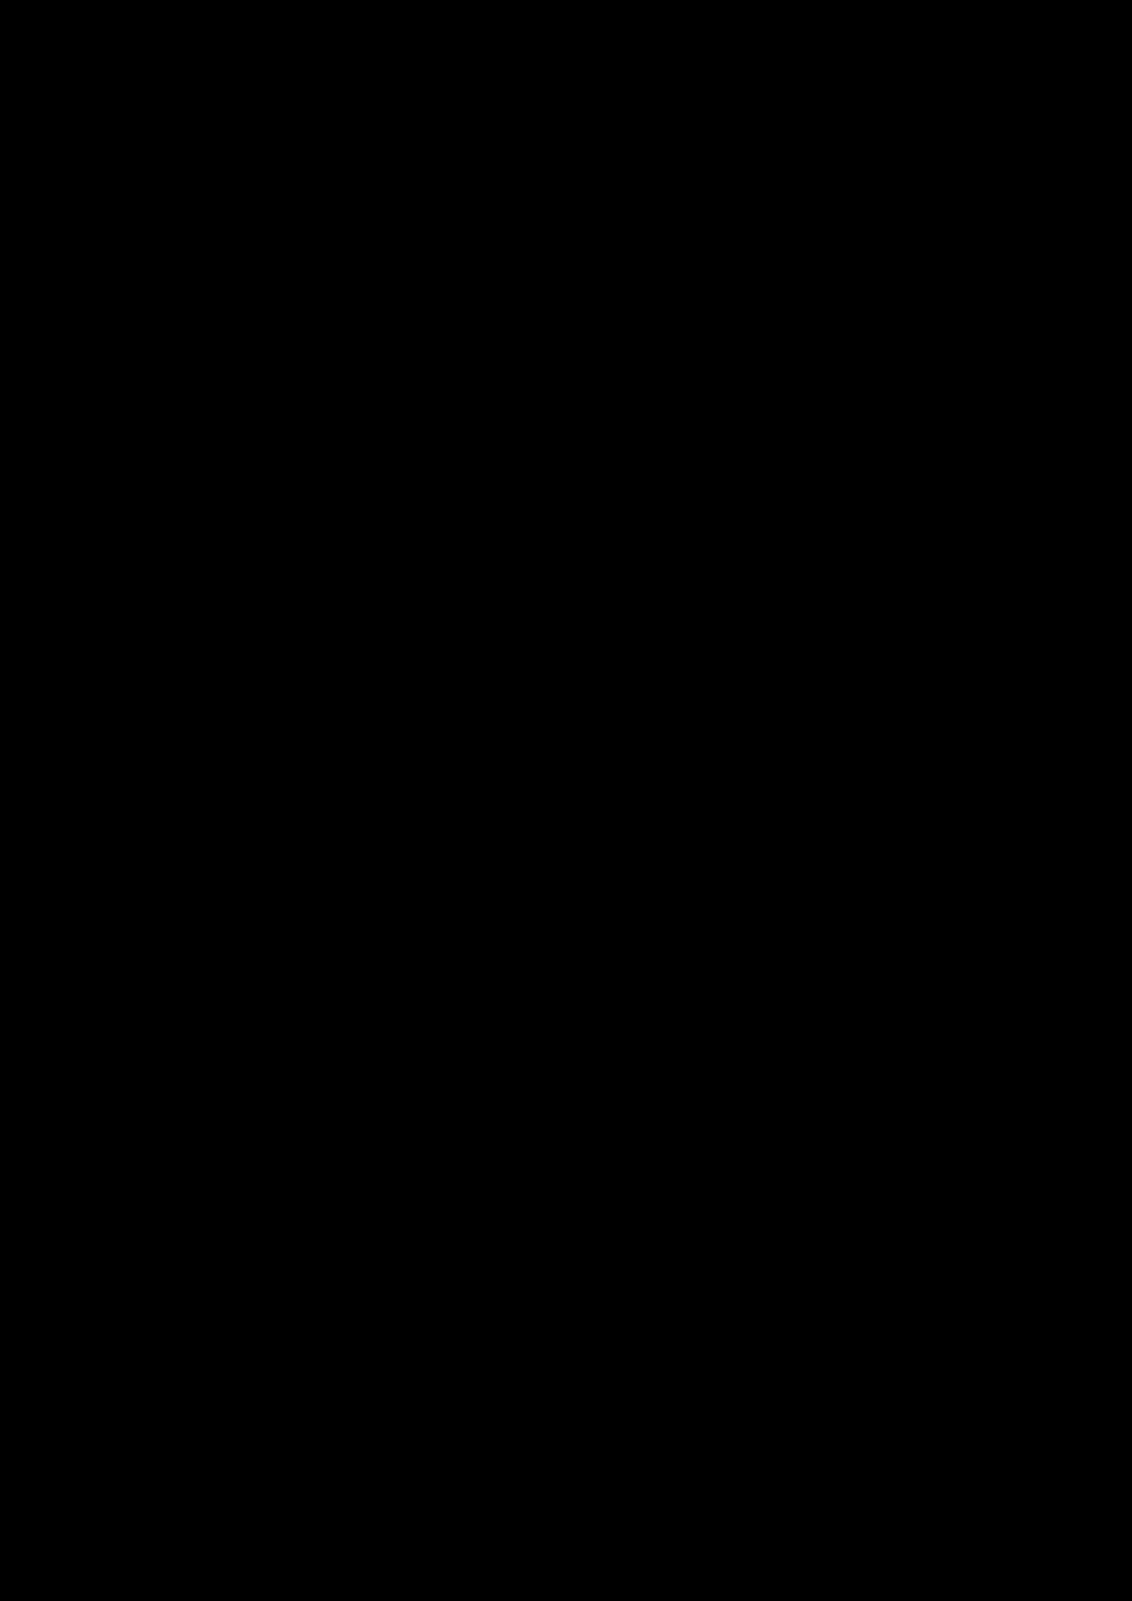 Deklassirovannyim elementam slide, Image 3